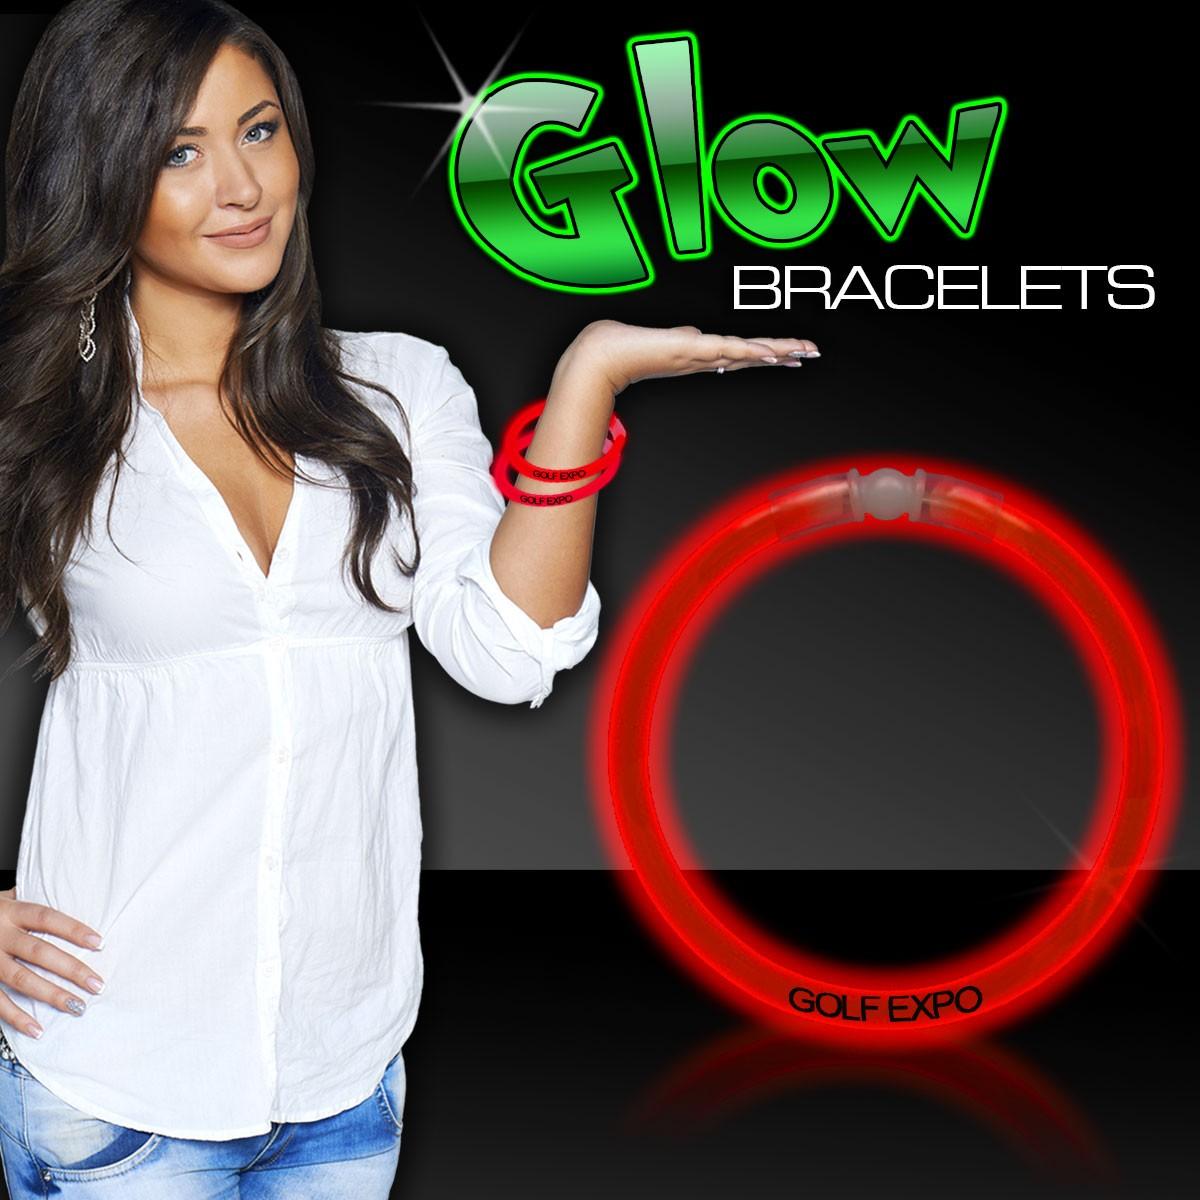 Red Superior 8 Inch Glow Bracelets